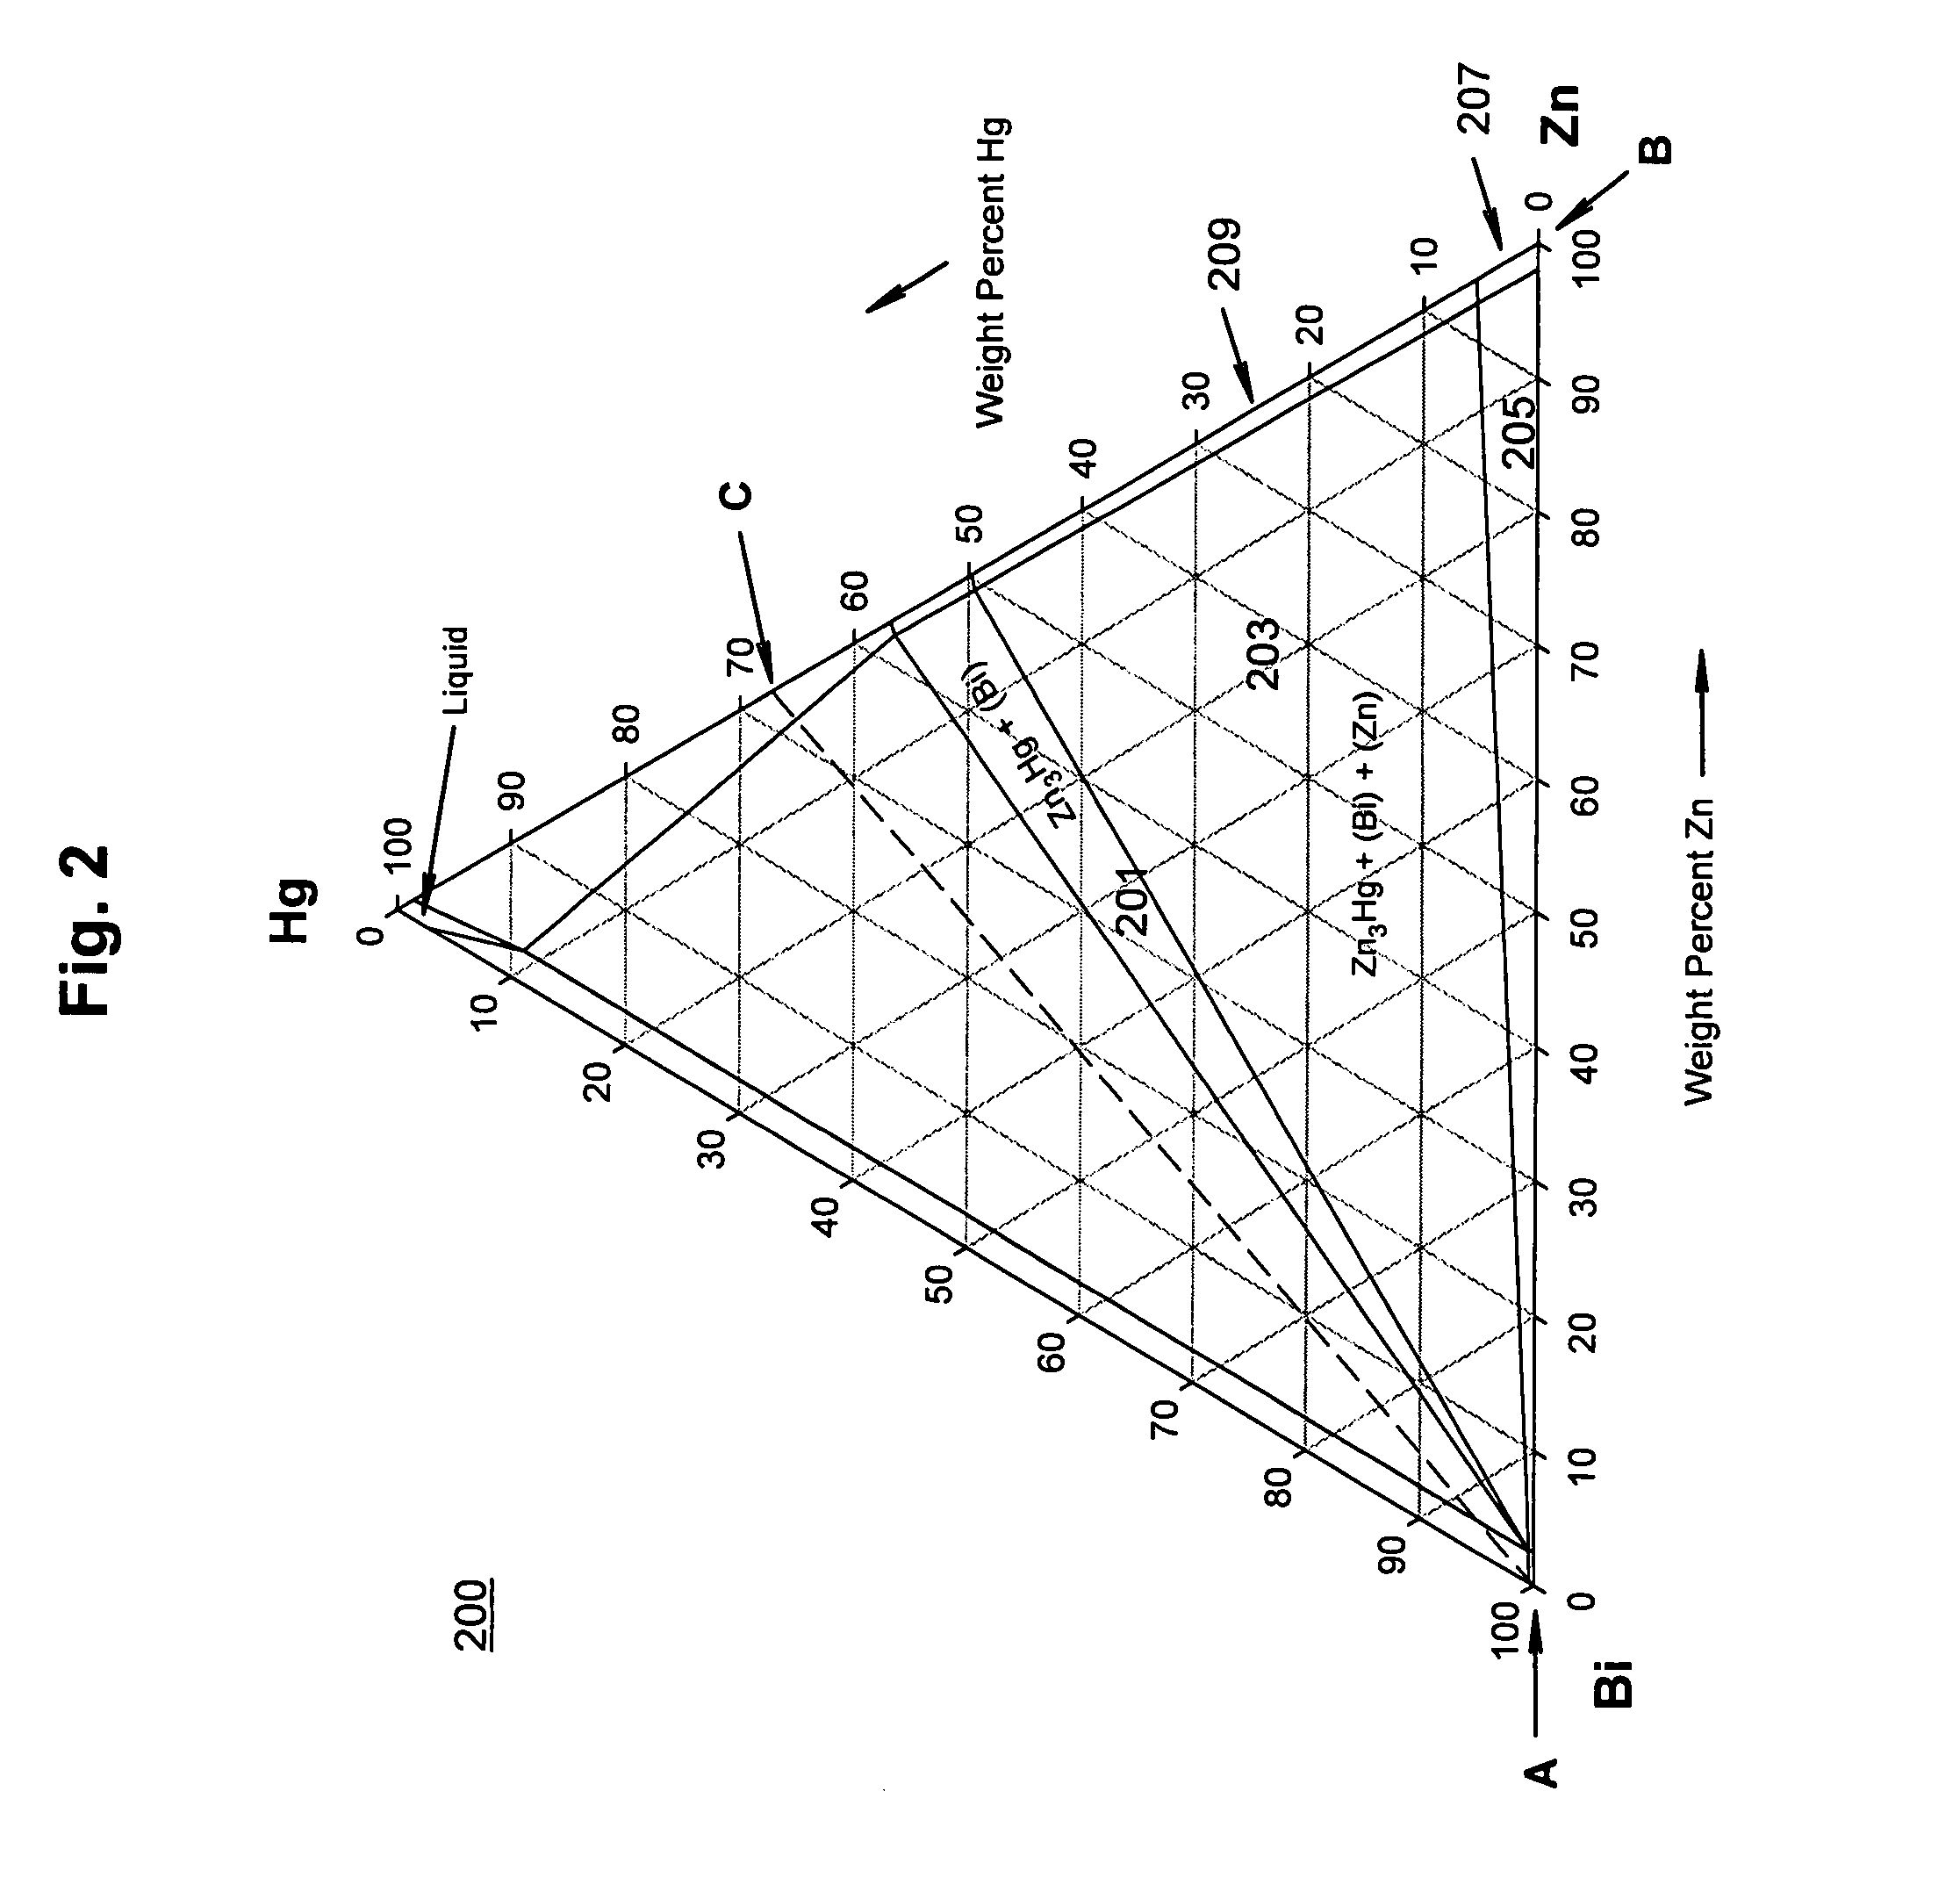 wiring diagrams for a sodium vapor lamps metal halide lamp High Pressure  Sodium Vapor Lights High Pressure Sodium Vapor Lights